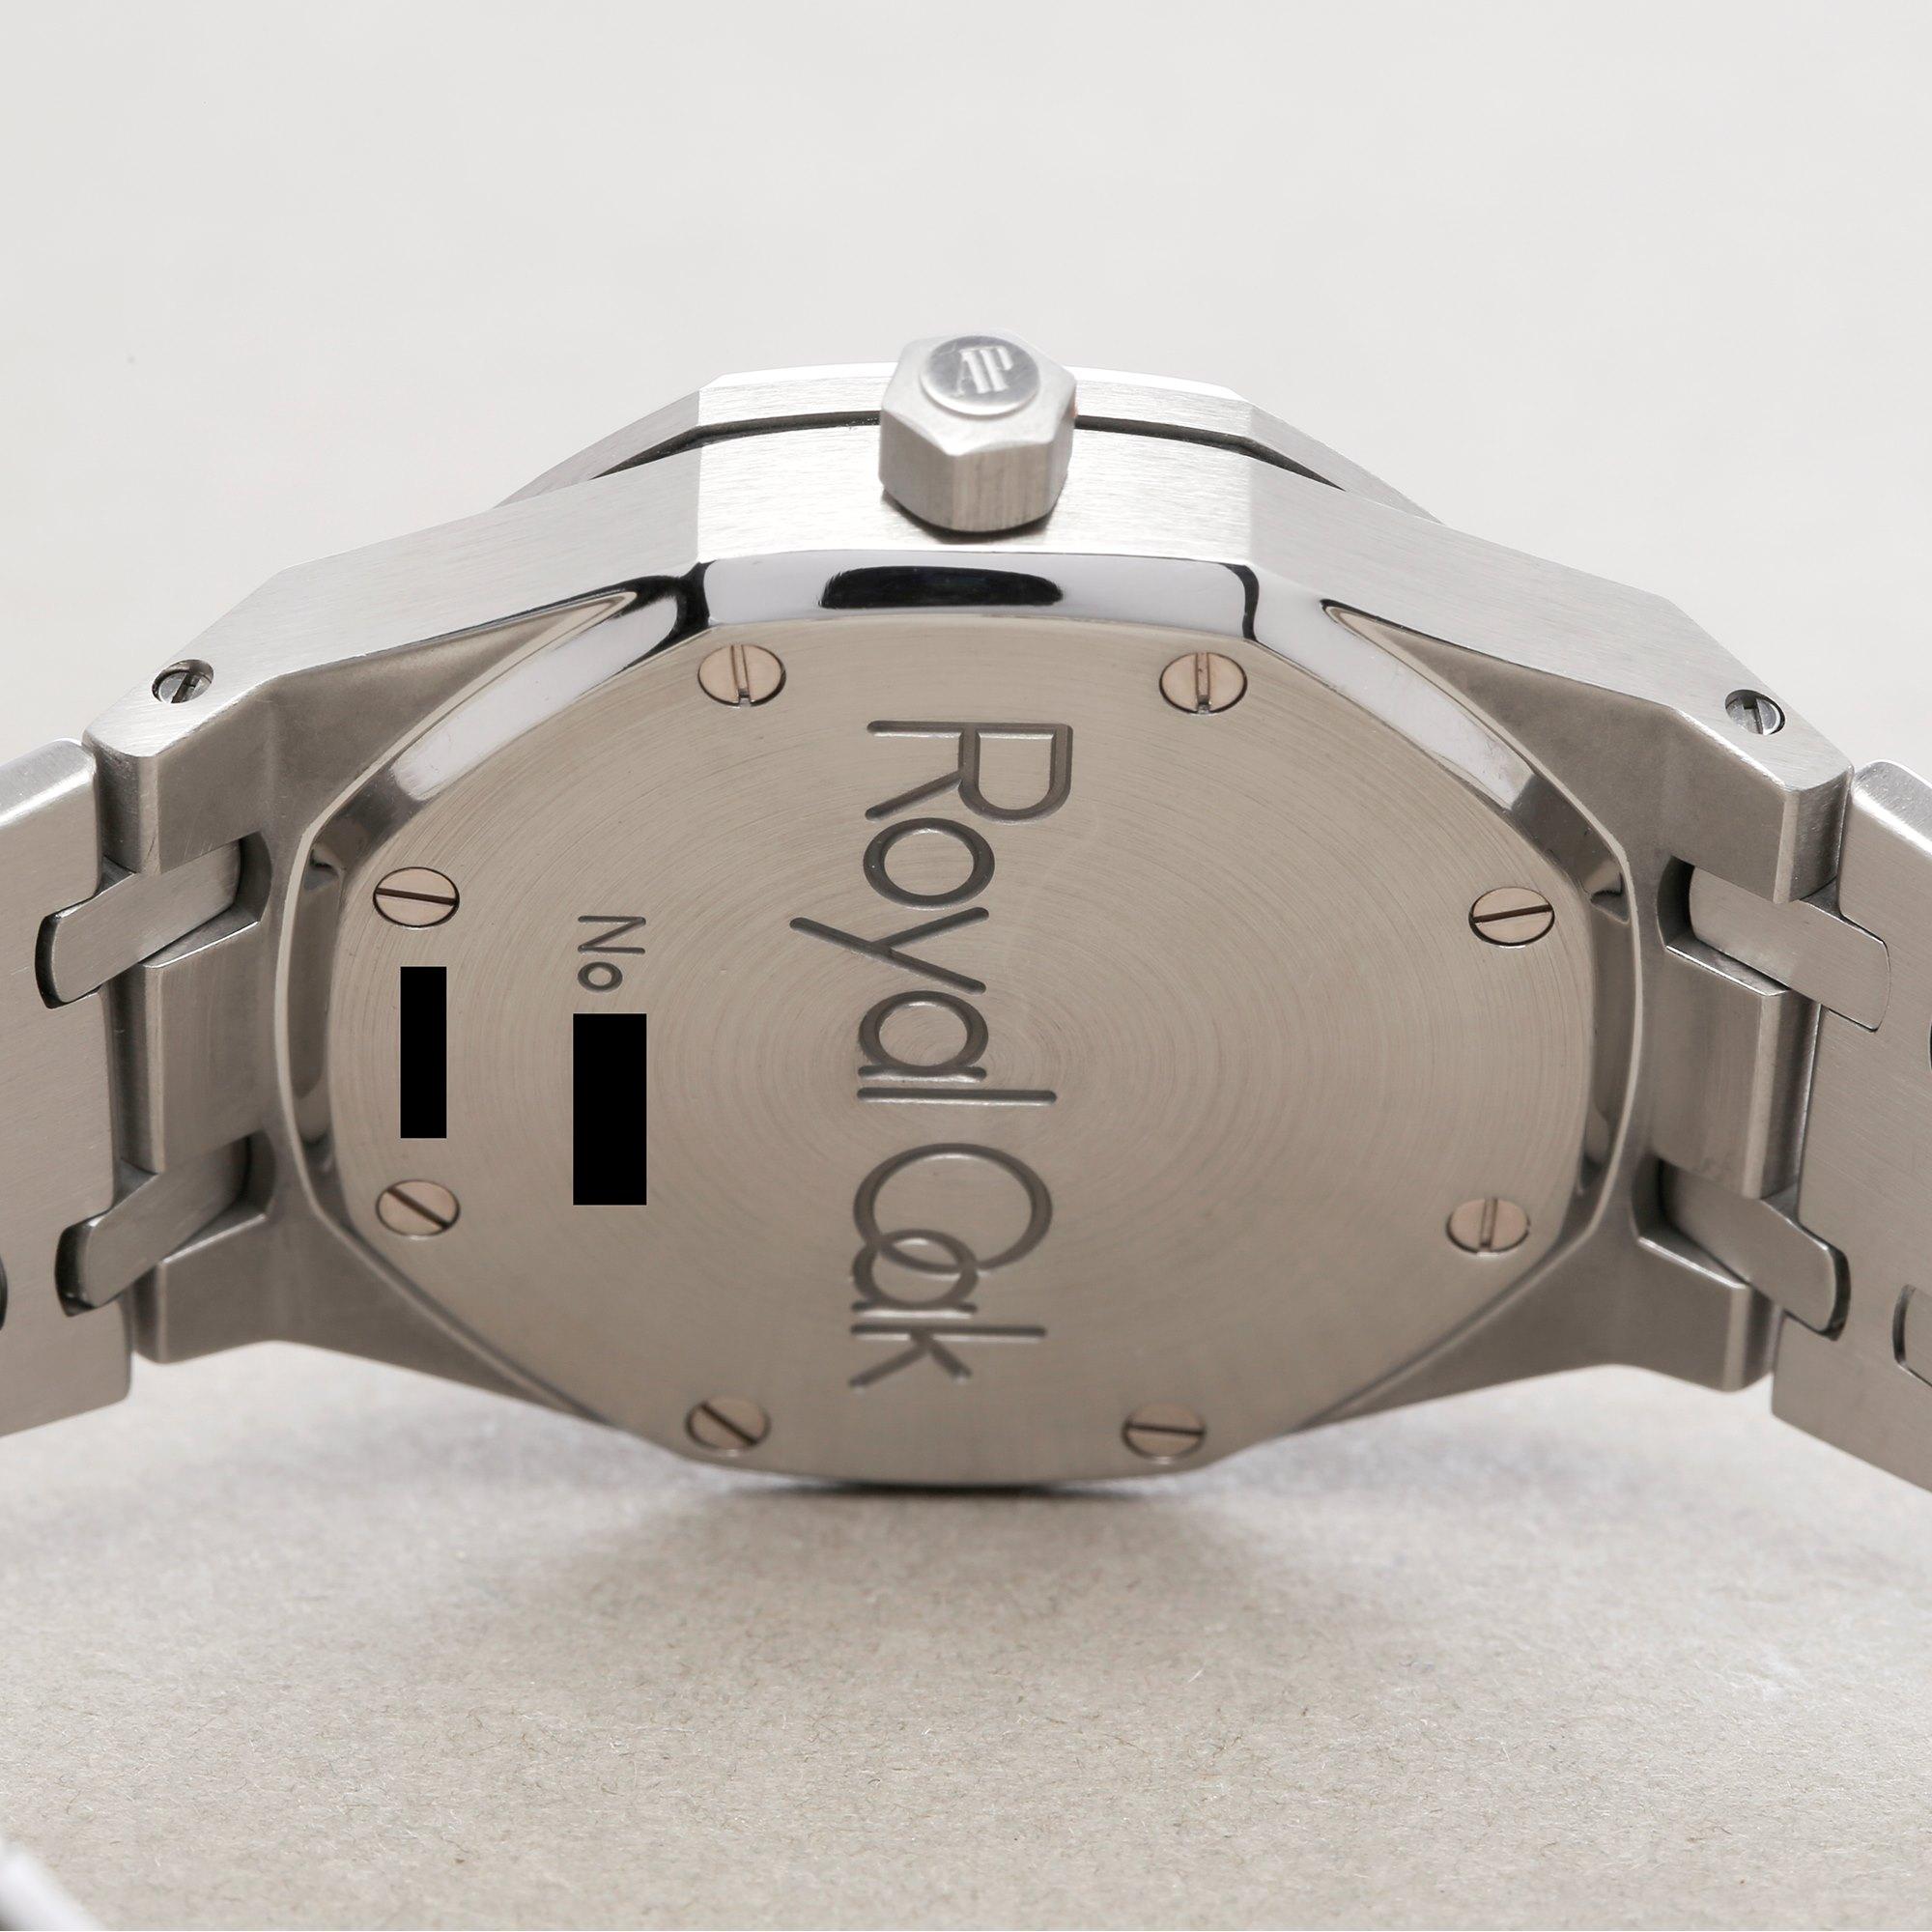 Audemars Piguet Royal Oak Dual Time Power Reserve Stainless Steel 25730ST